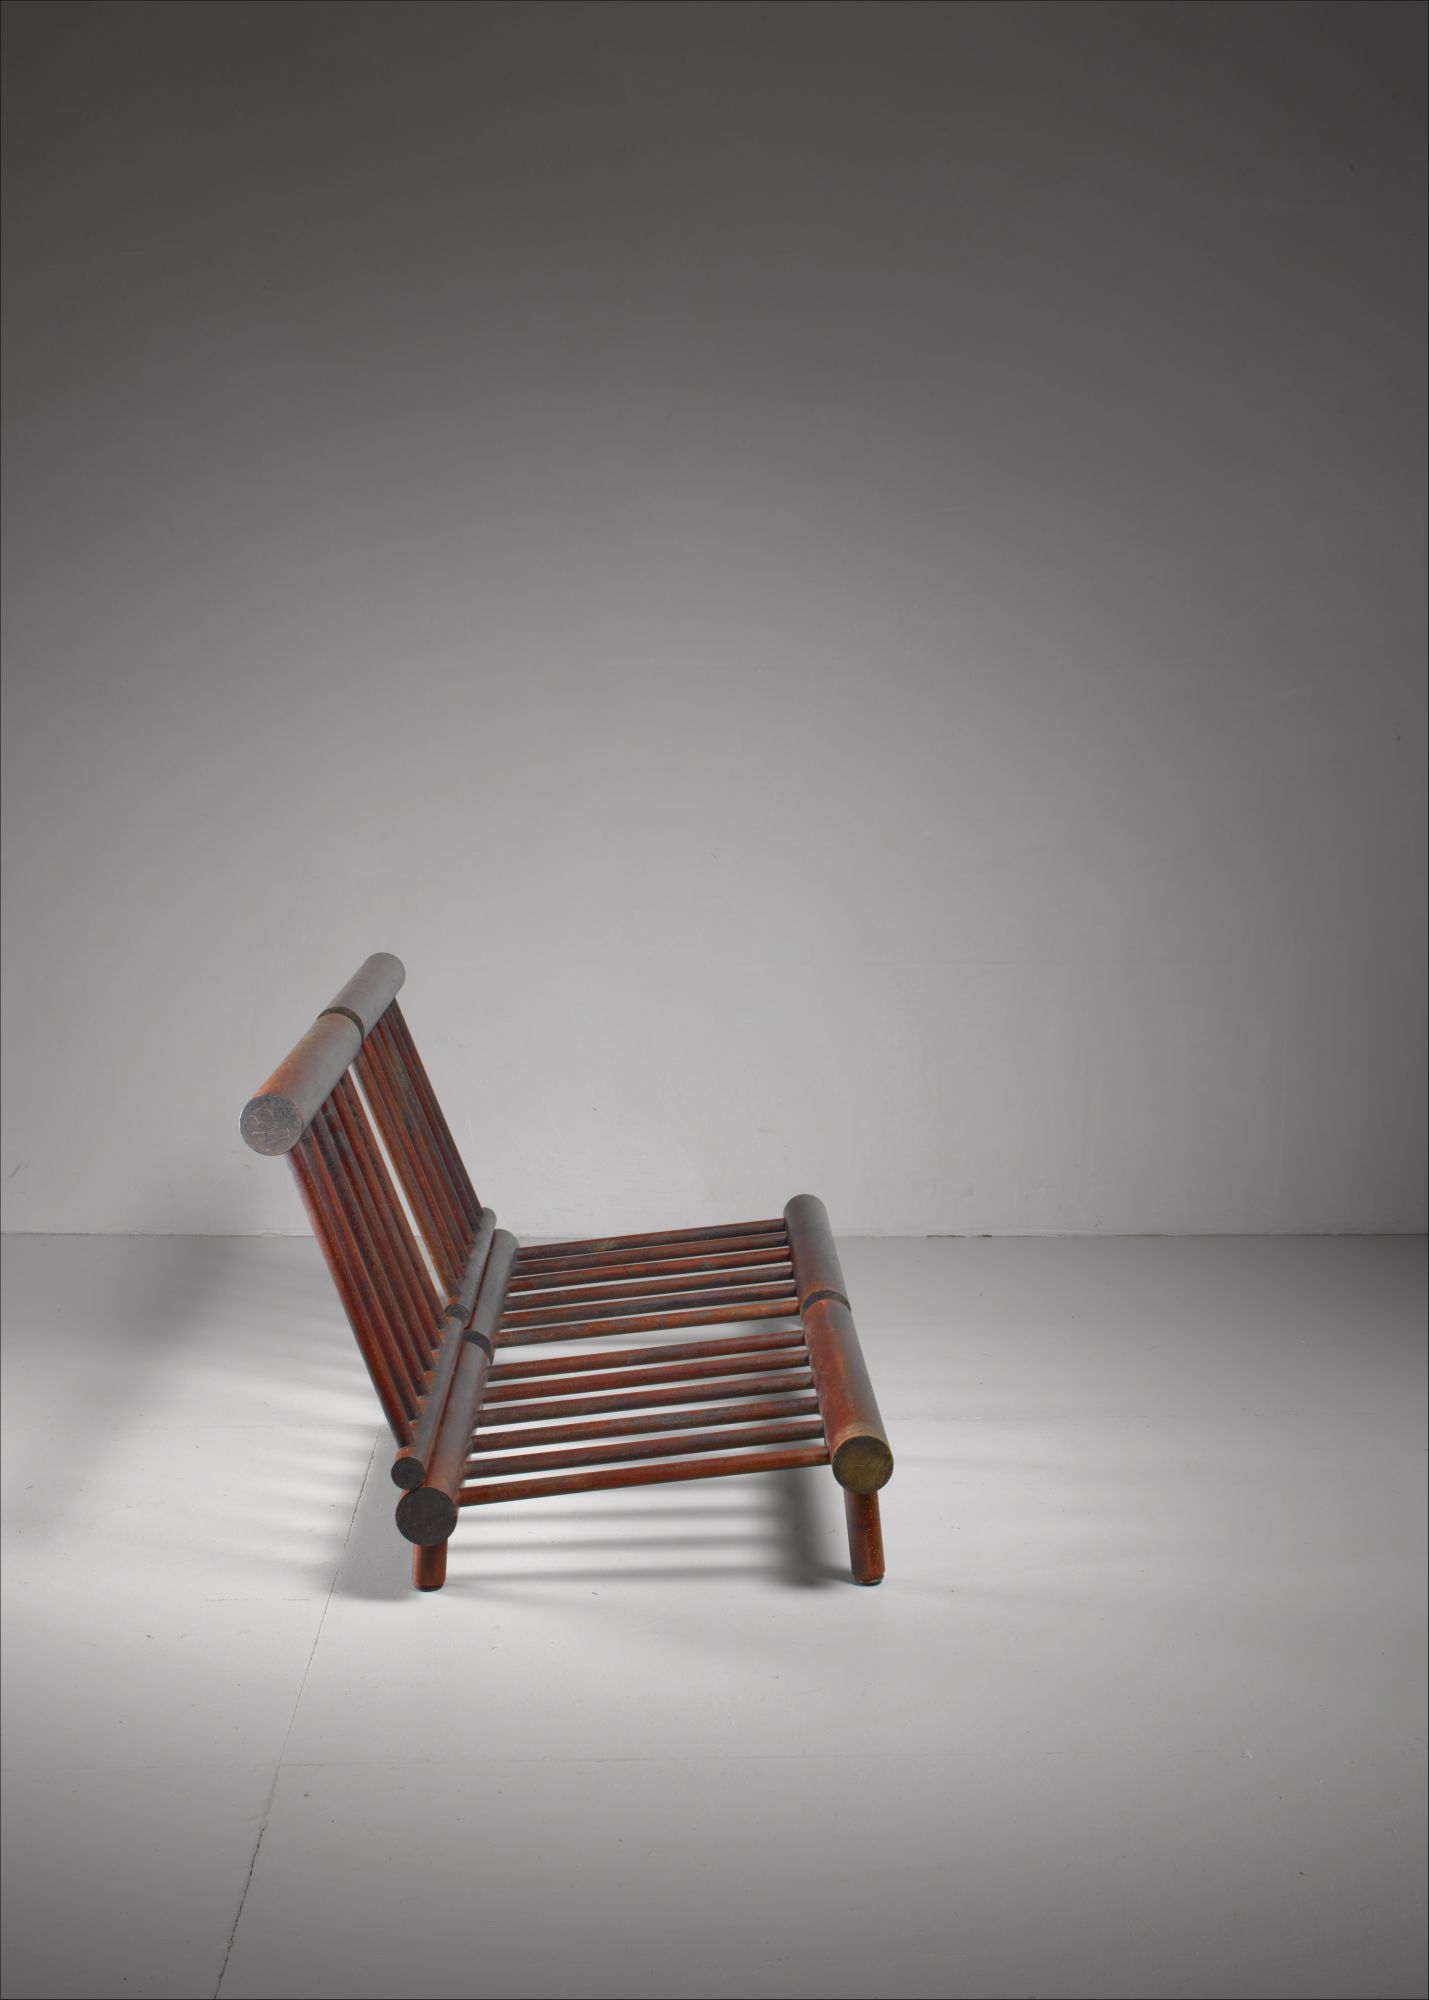 Remarkable Charlotte Perriand Pair Of Low Lounge Chairs France 1968 Inzonedesignstudio Interior Chair Design Inzonedesignstudiocom